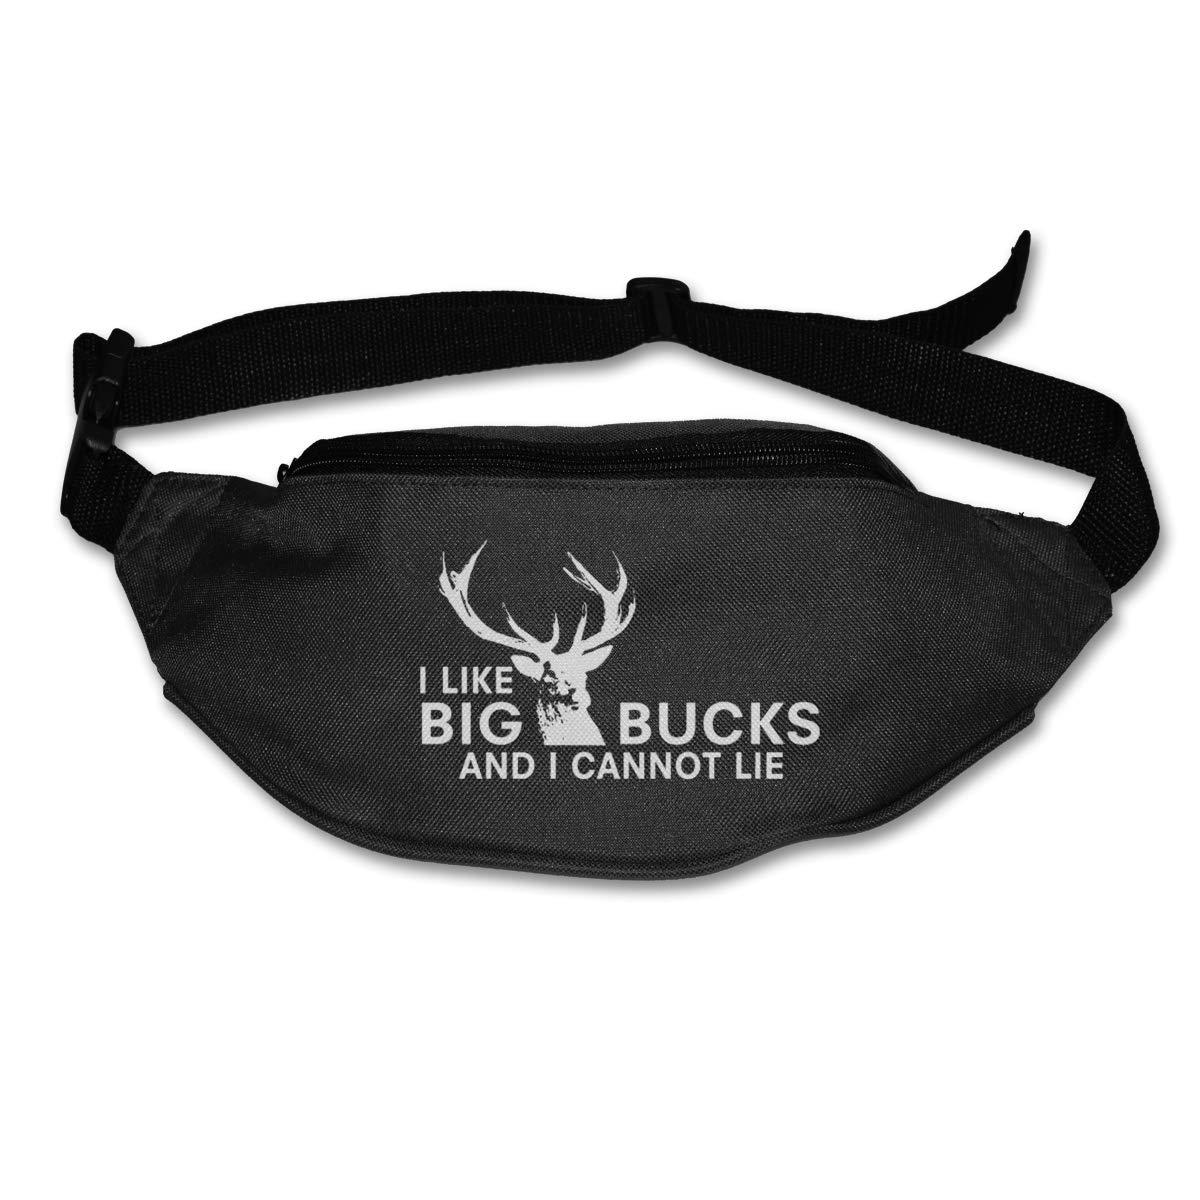 I Like Big Bucks And I Cannot Lie Sport Waist Pack Fanny Pack Adjustable For Run